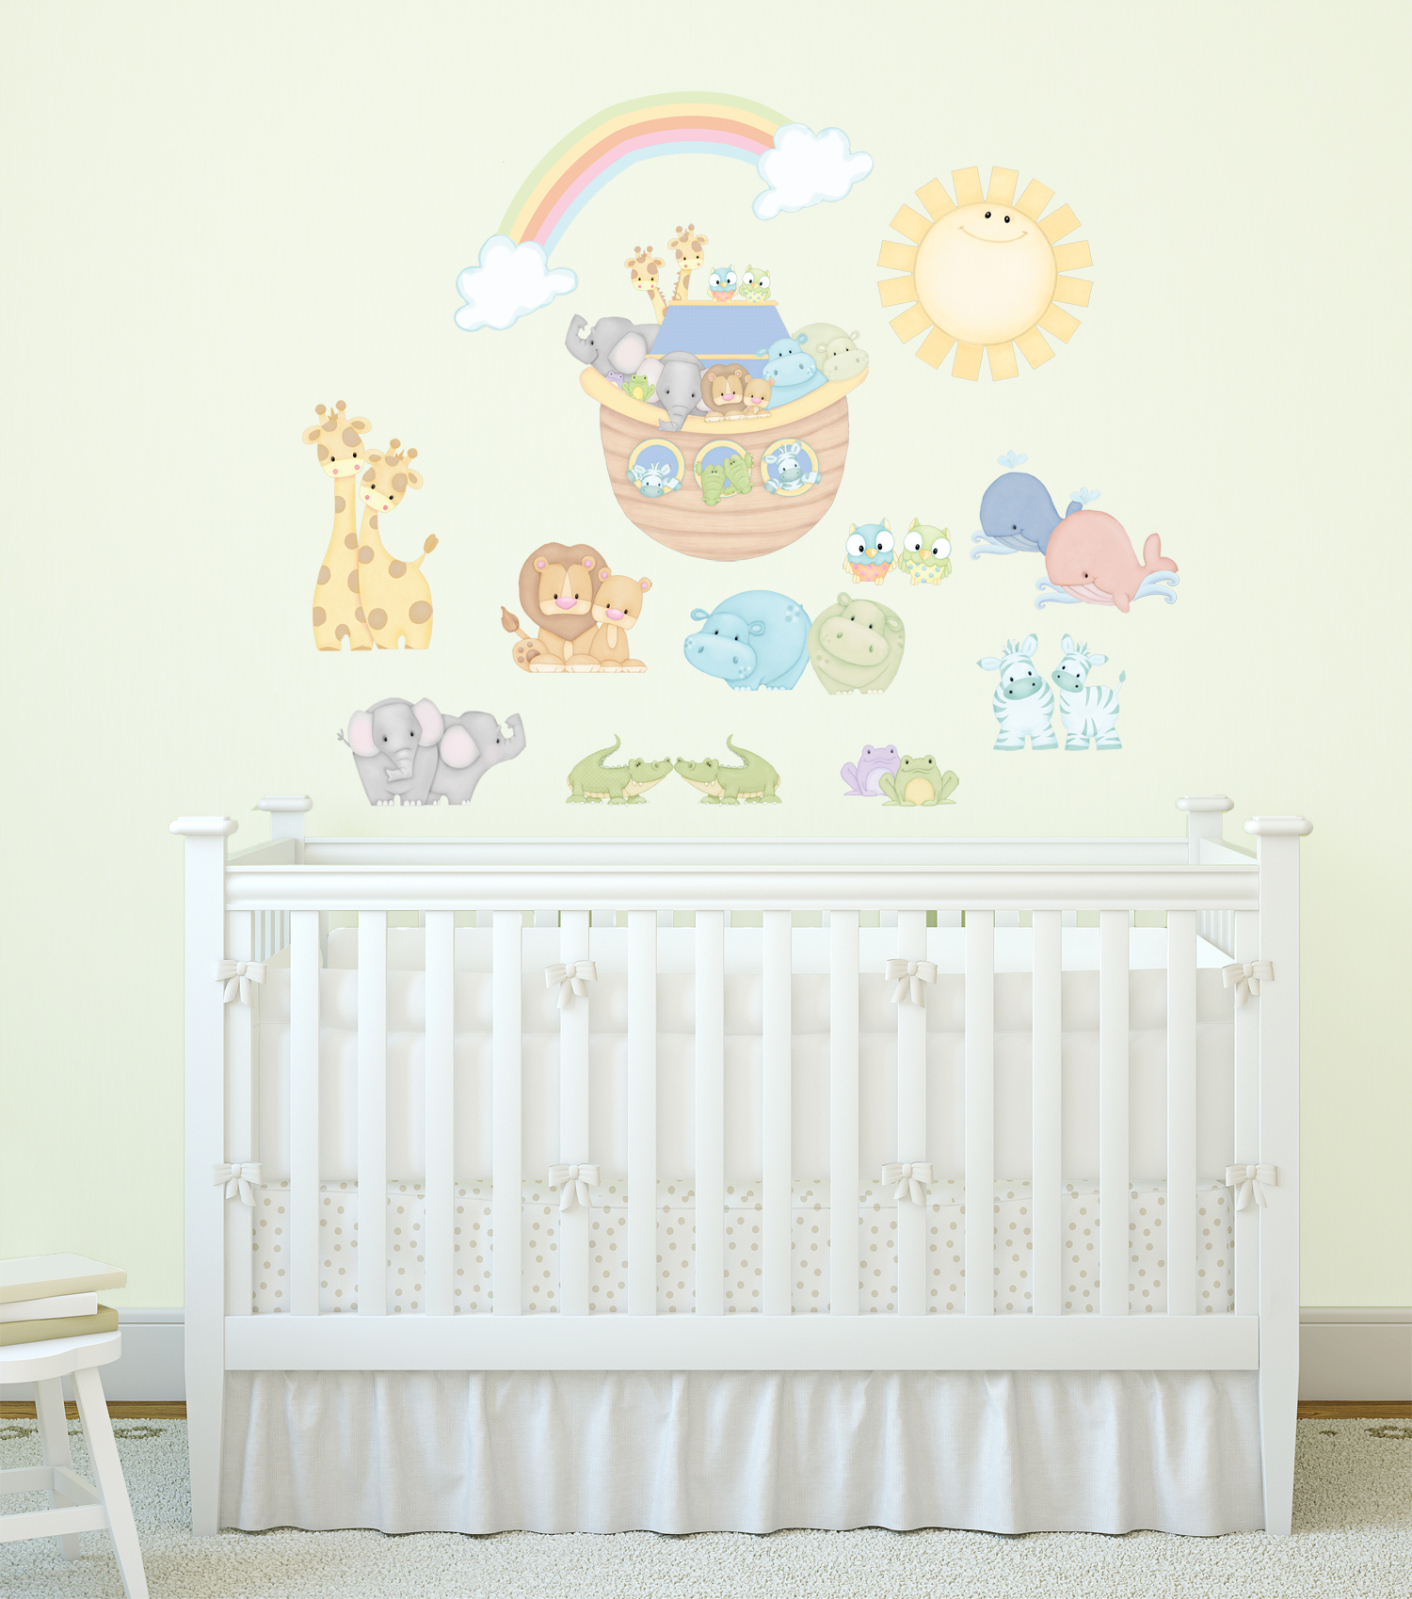 Noah S Blue Pastel Pairs With Ark And Animals Super Jumbo Applique Wall Decals Walmart Com Walmart Com